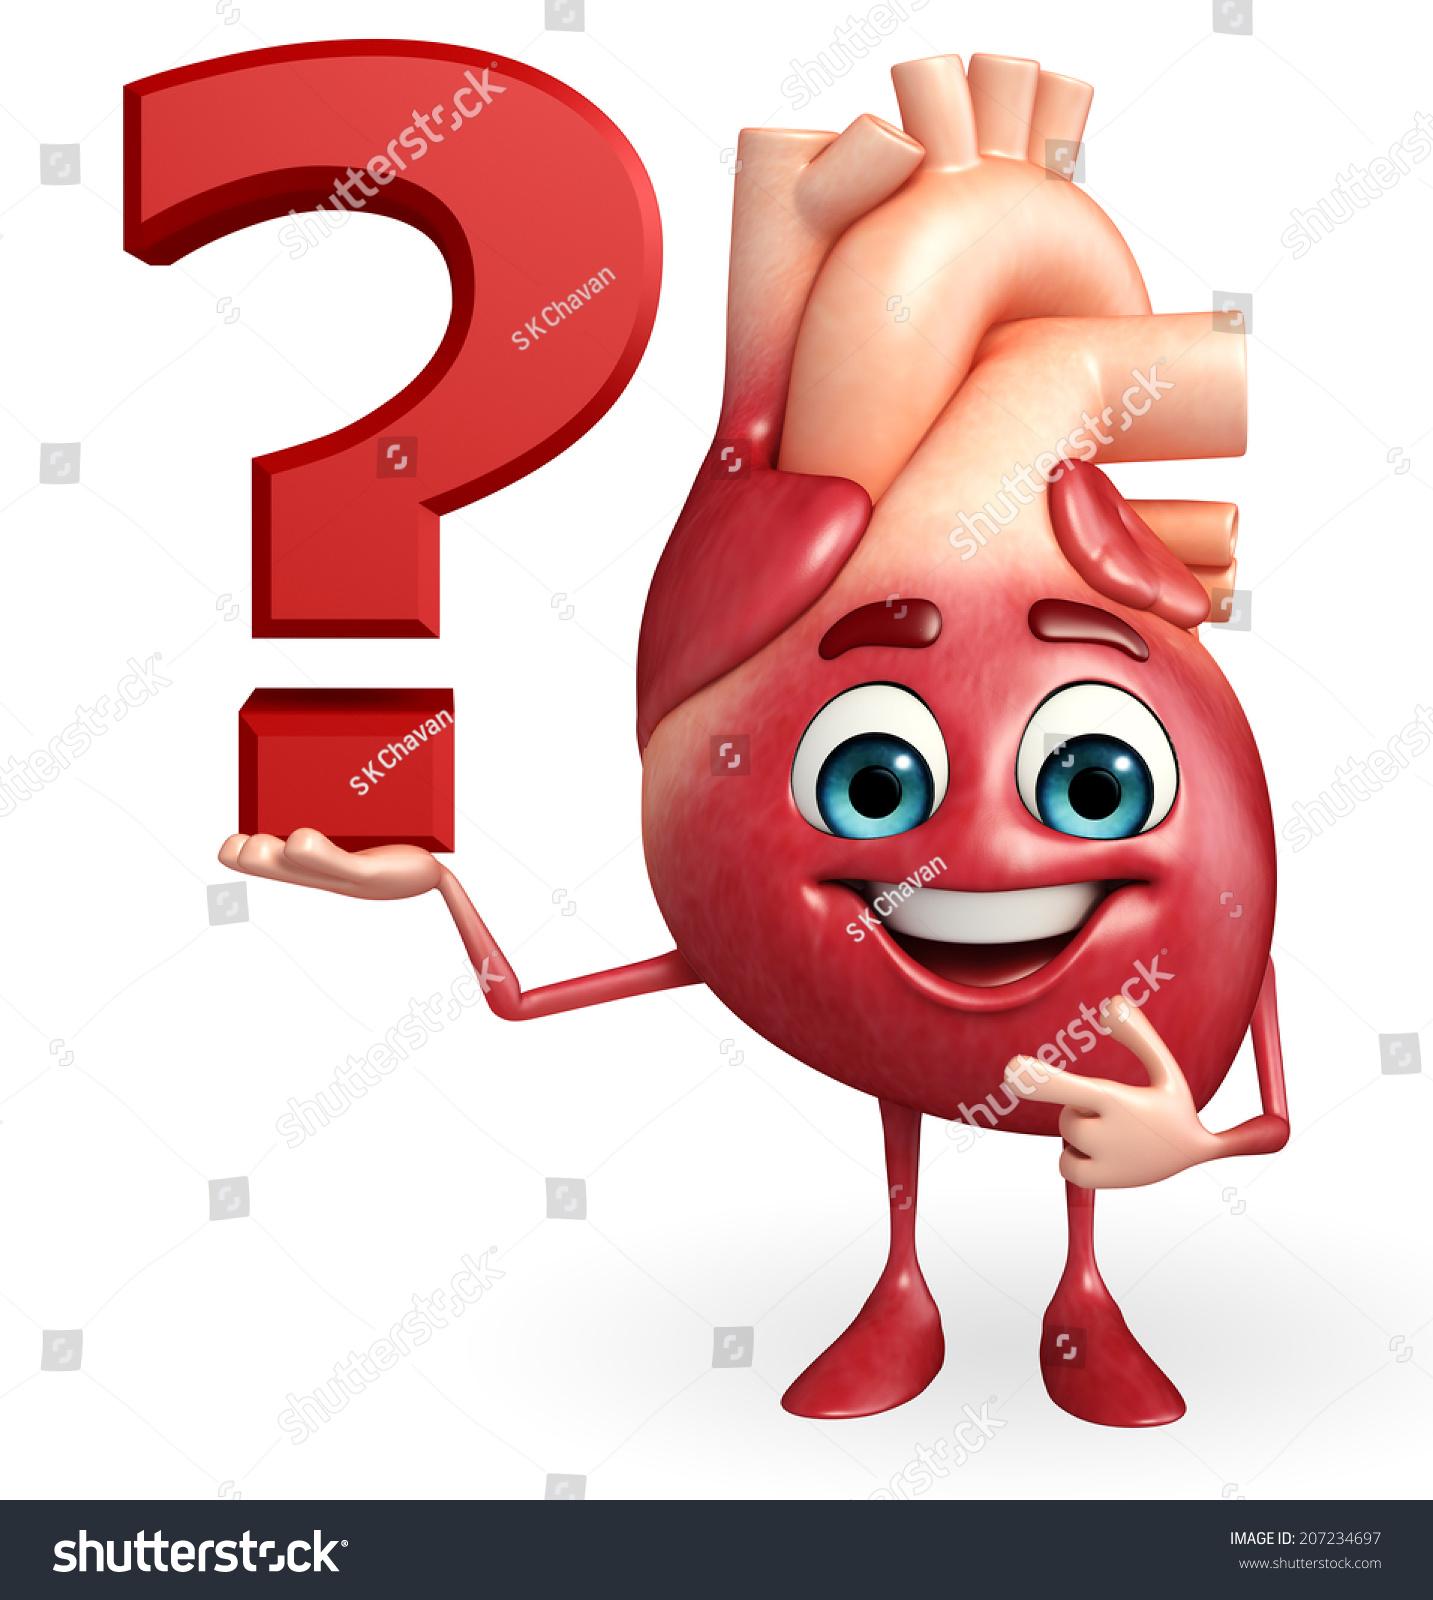 Cartoon Character Heart Question Mark Stock Illustration 207234697 ...